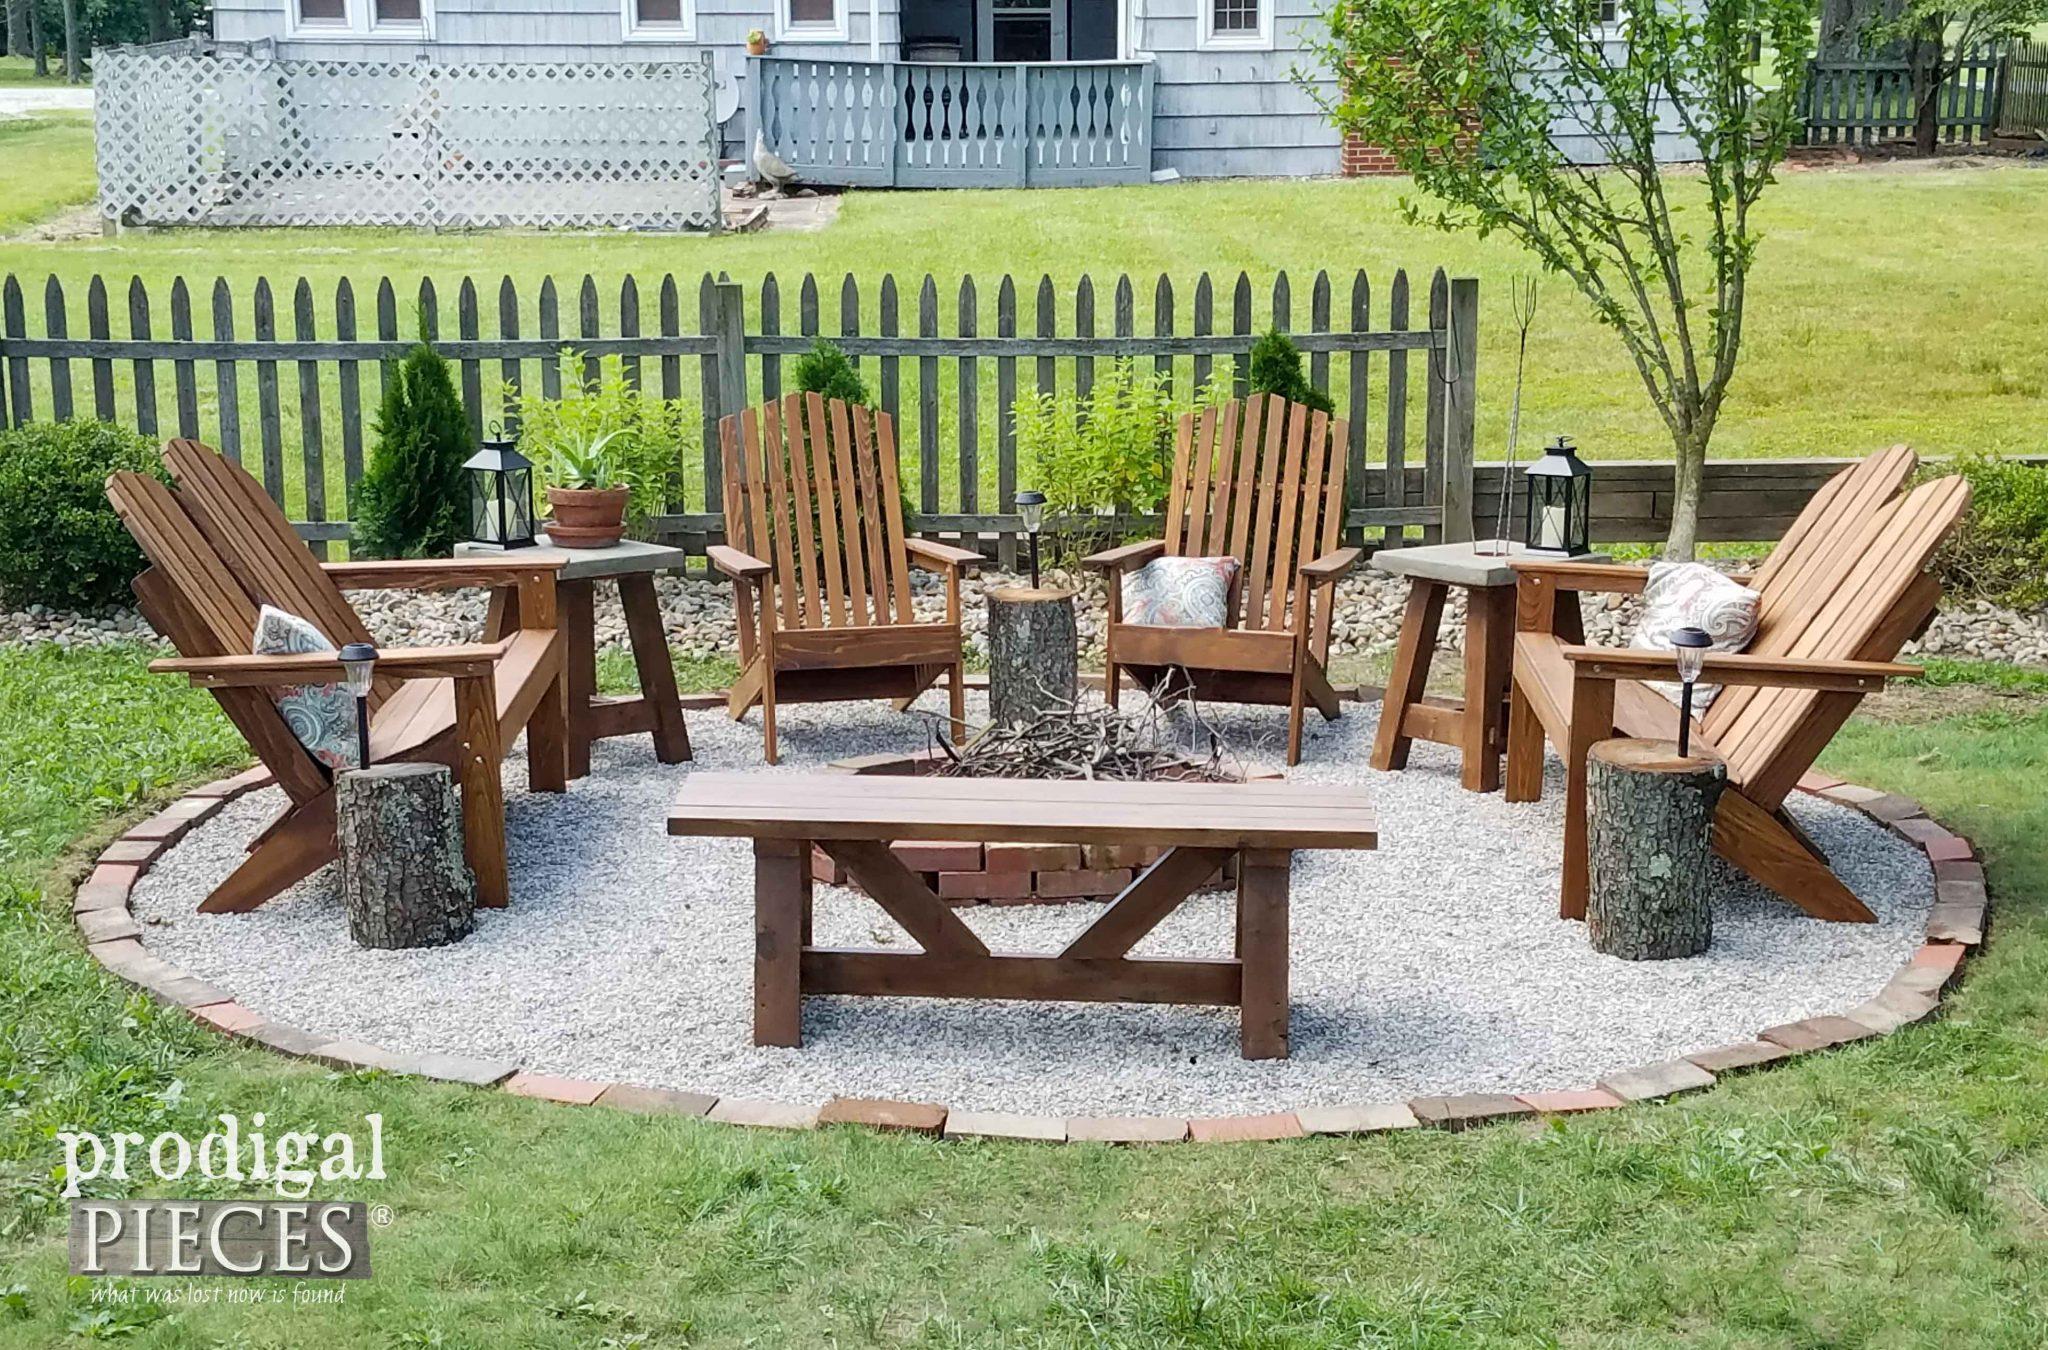 backyard fire pit chairs toddler chair walmart diy budget decor prodigal pieces